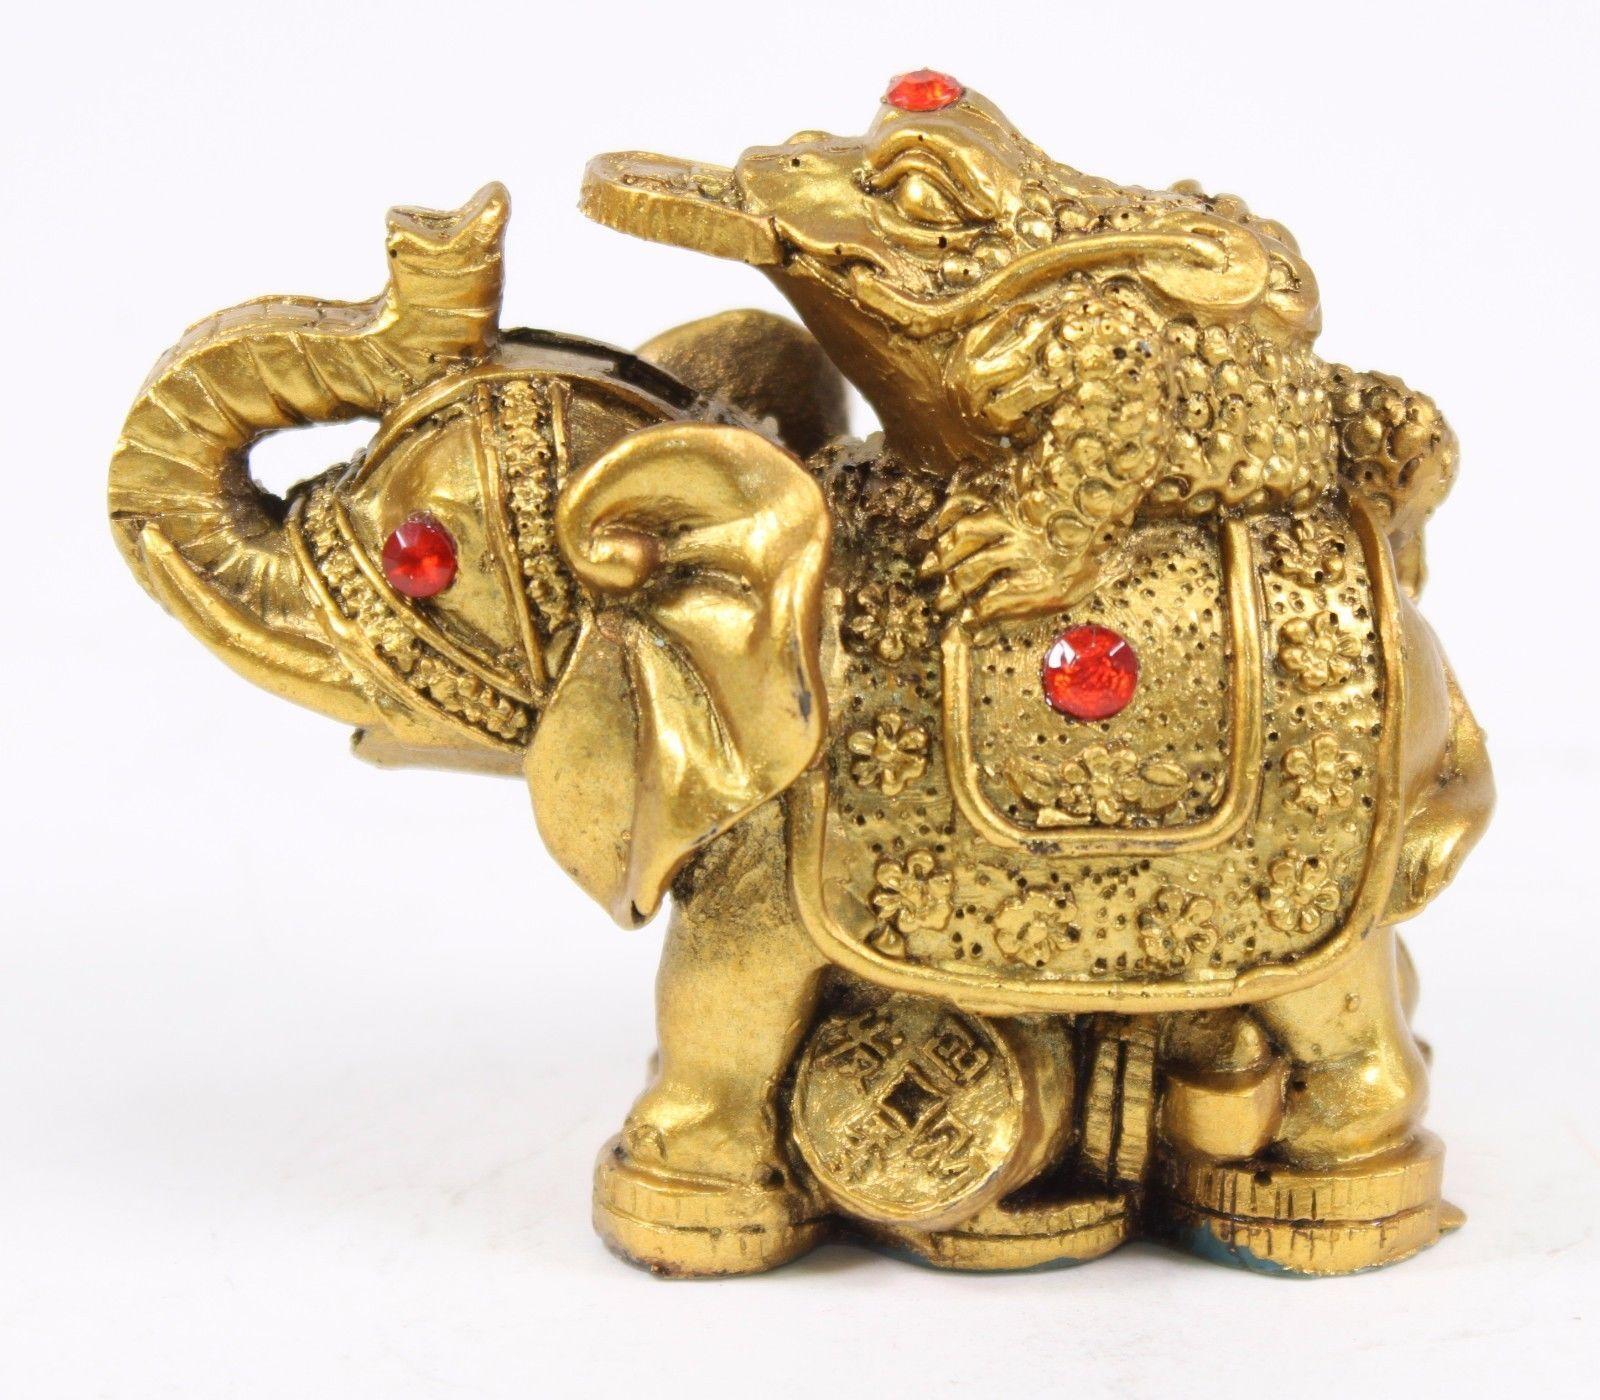 set of 6 fengshui buddha money frog tree elephant piggy dragon turtle home decor ebay. Black Bedroom Furniture Sets. Home Design Ideas